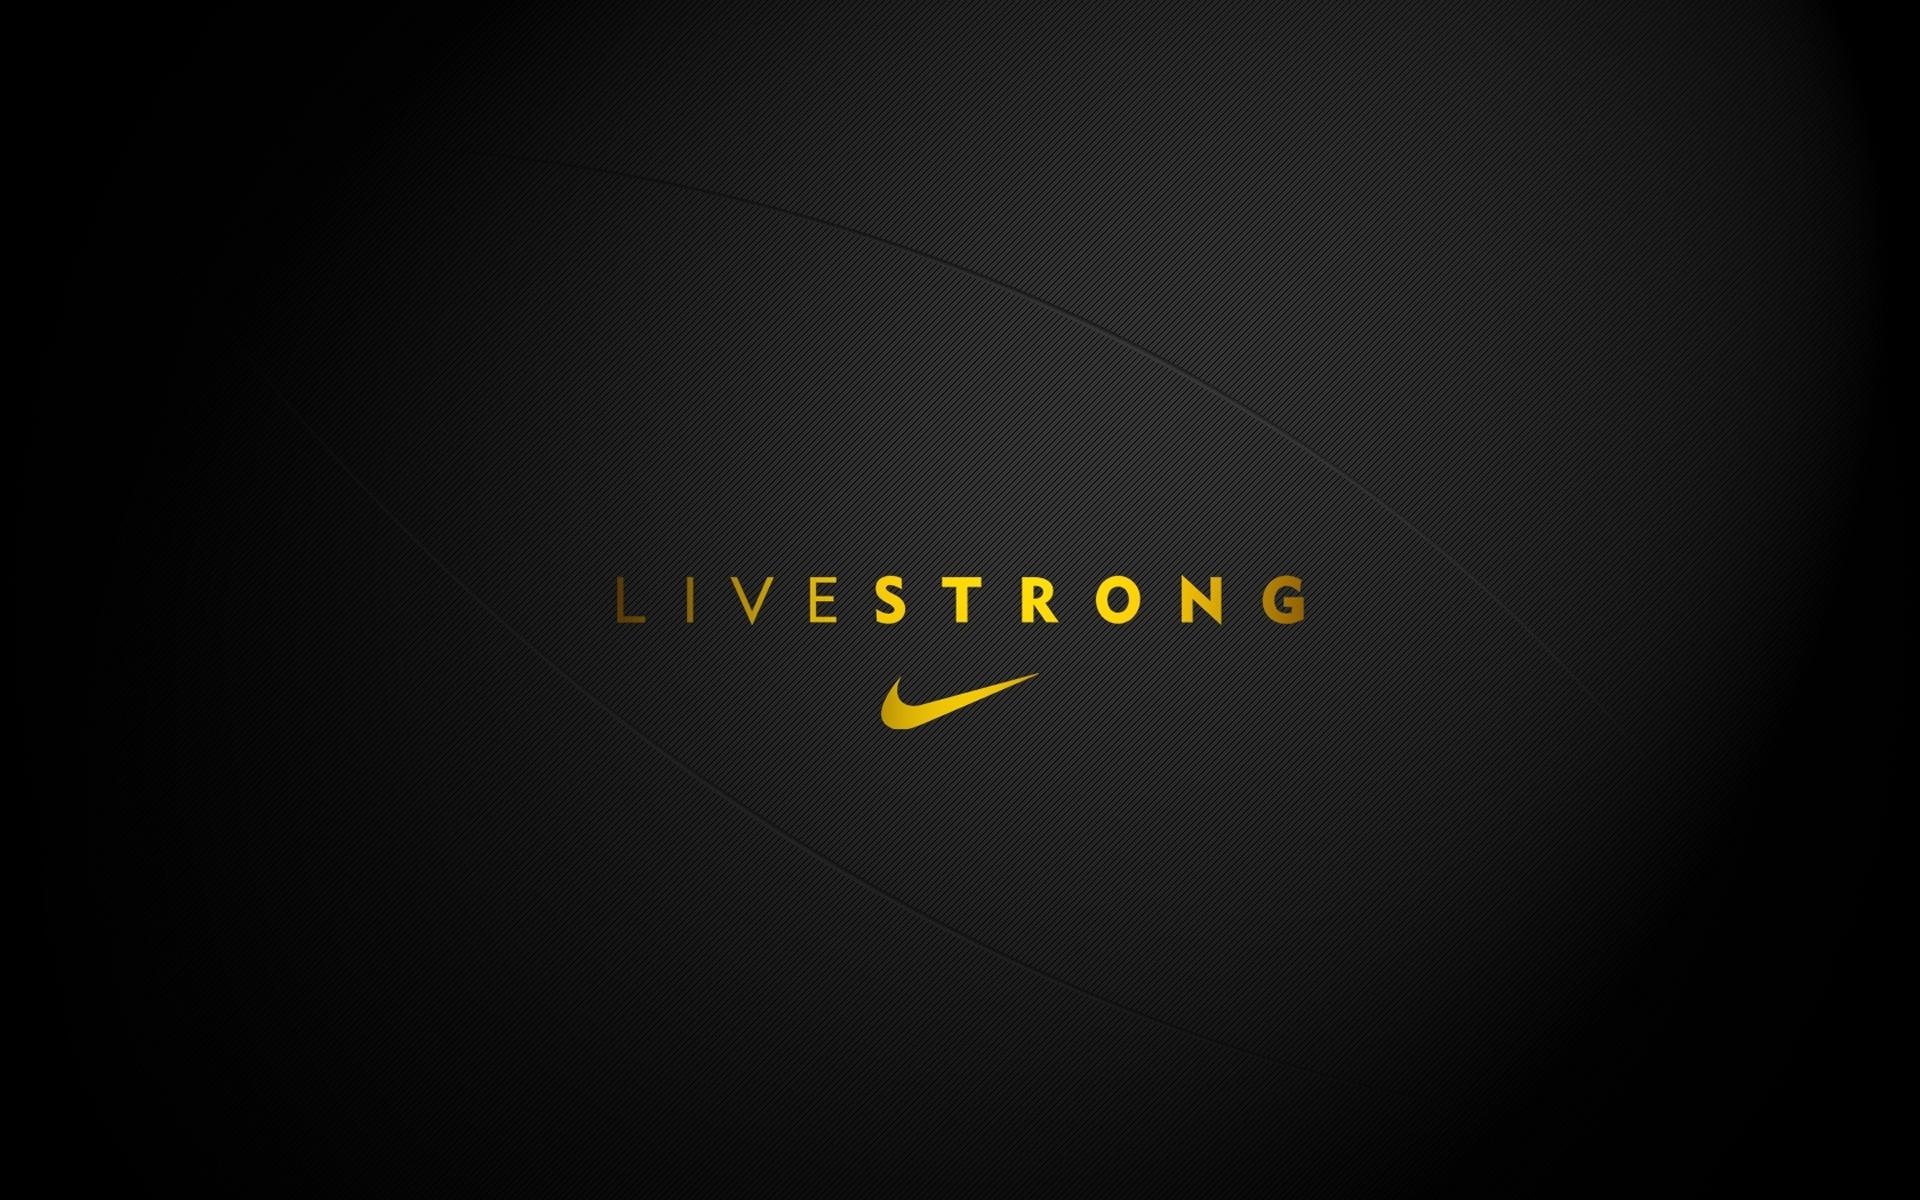 Nike Livestrong Wallpaper